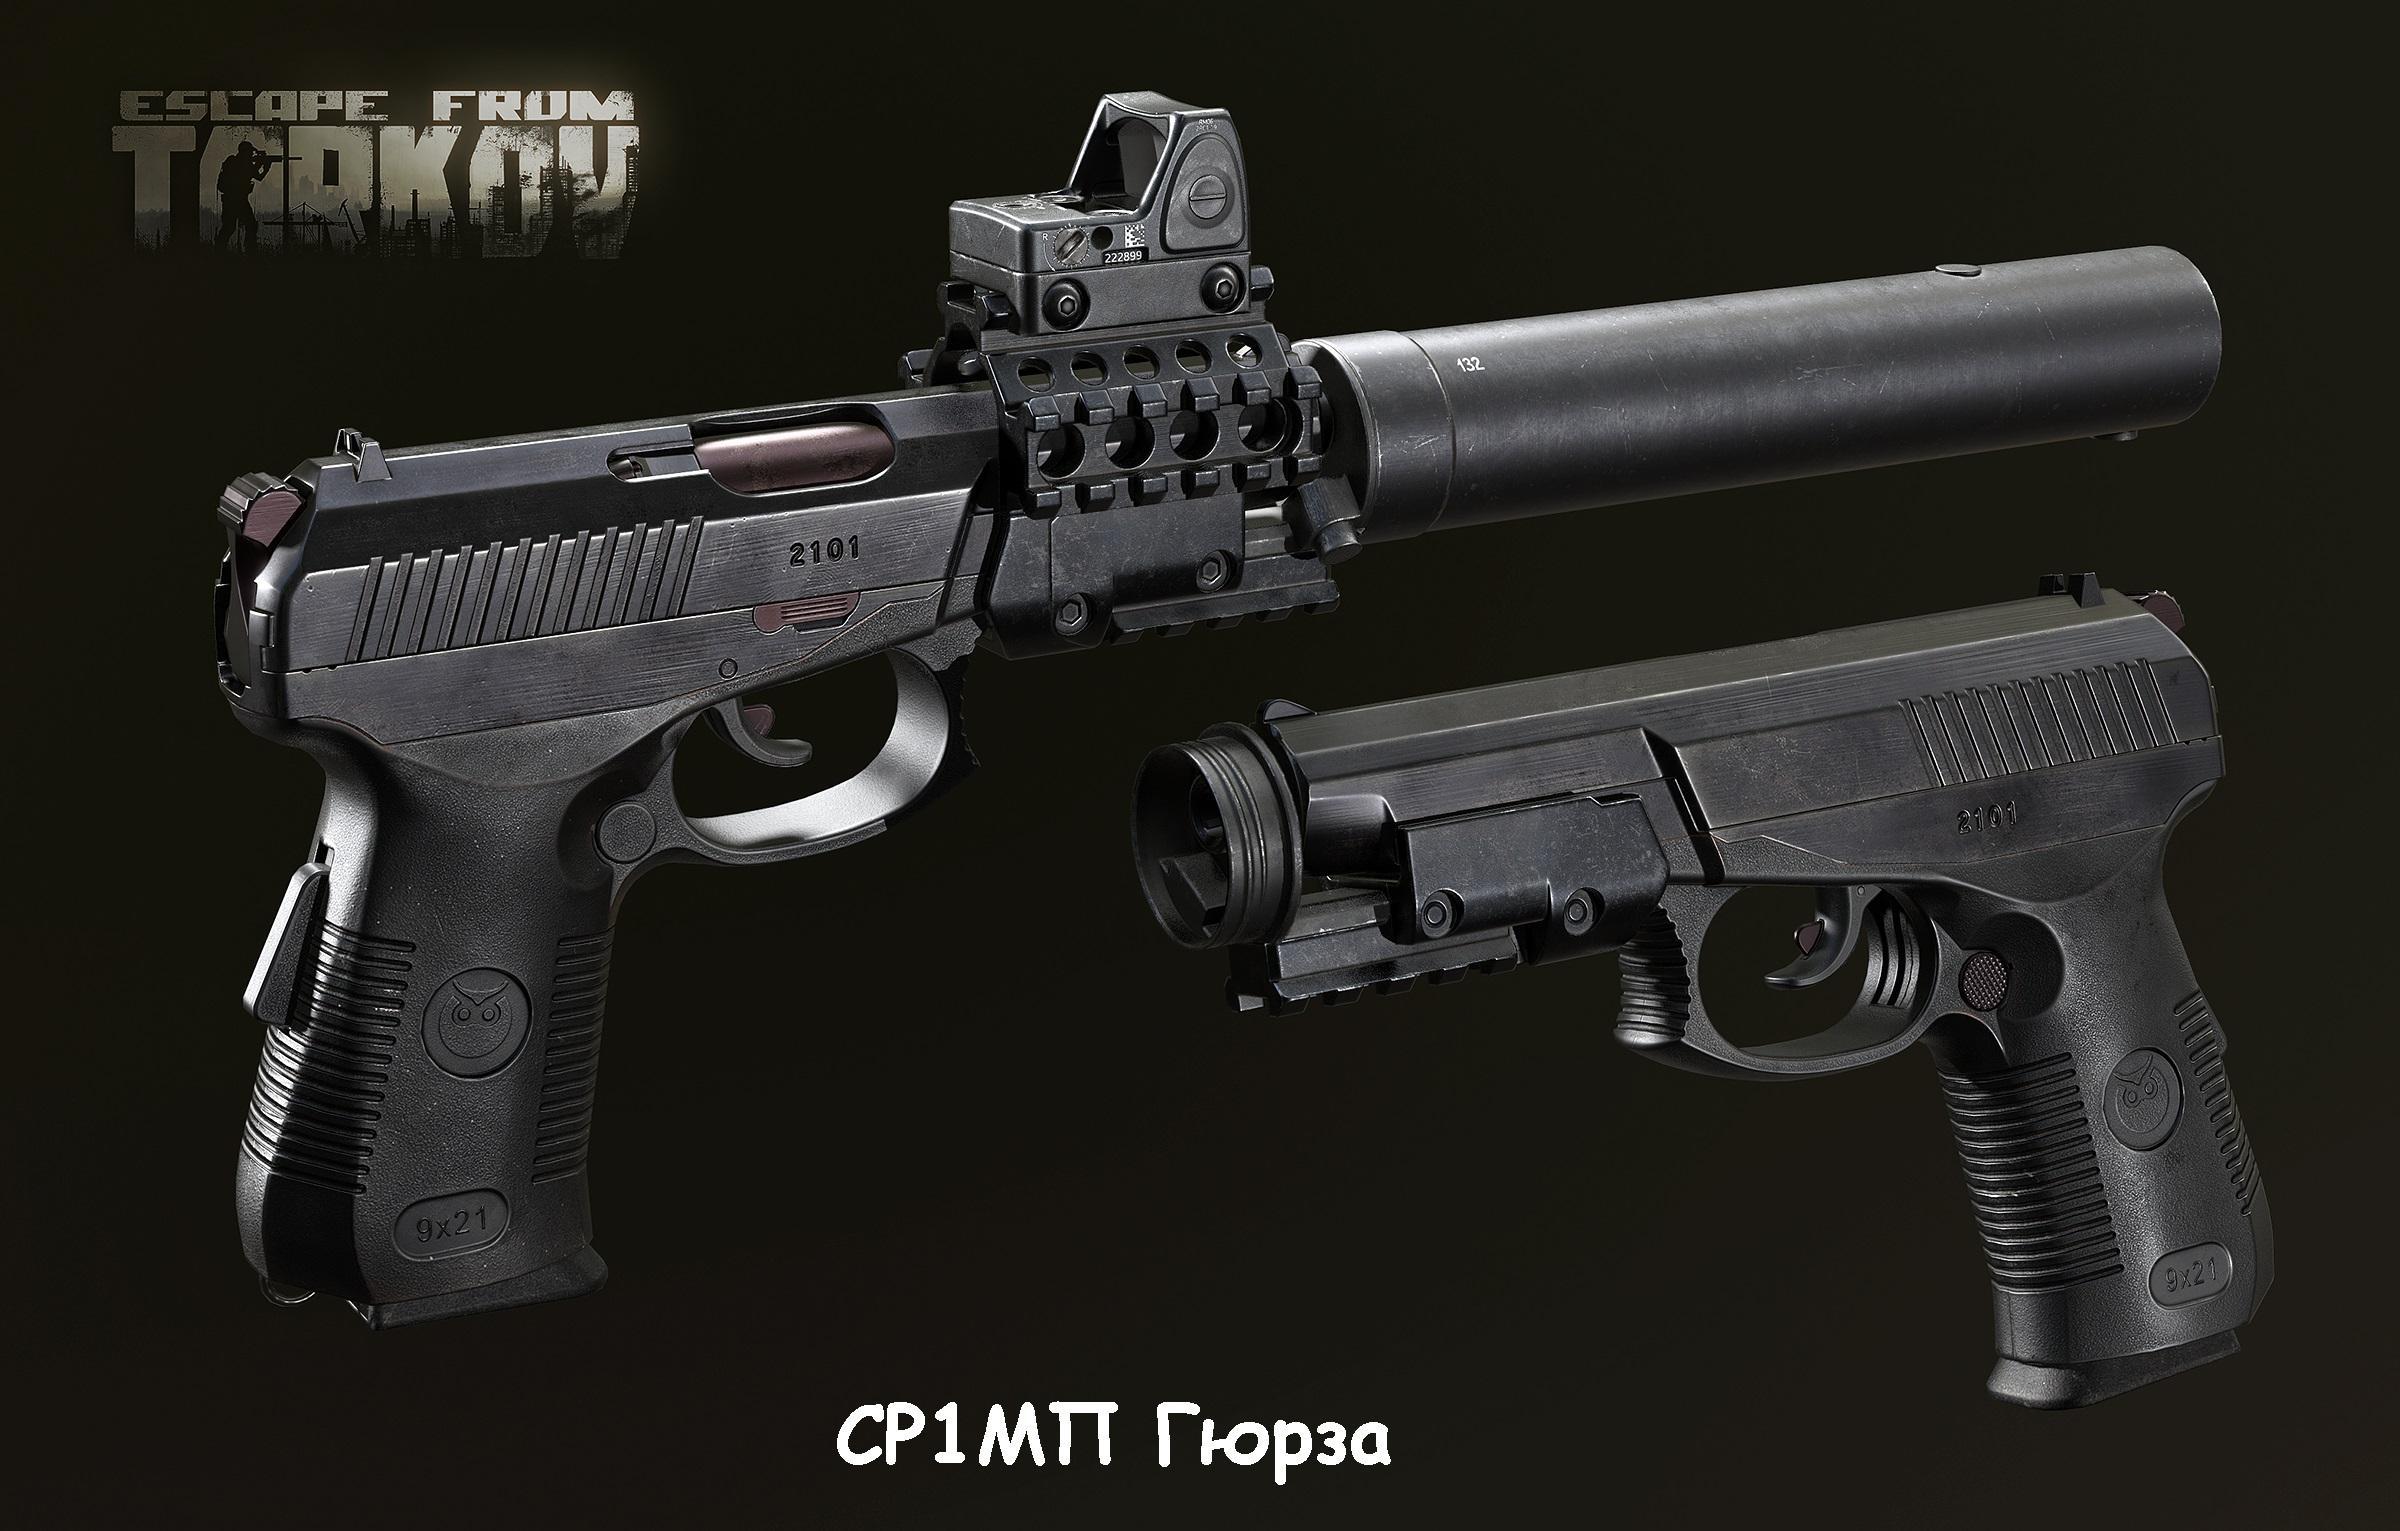 Escape from Tarkov оружие СР1МП Гюрза